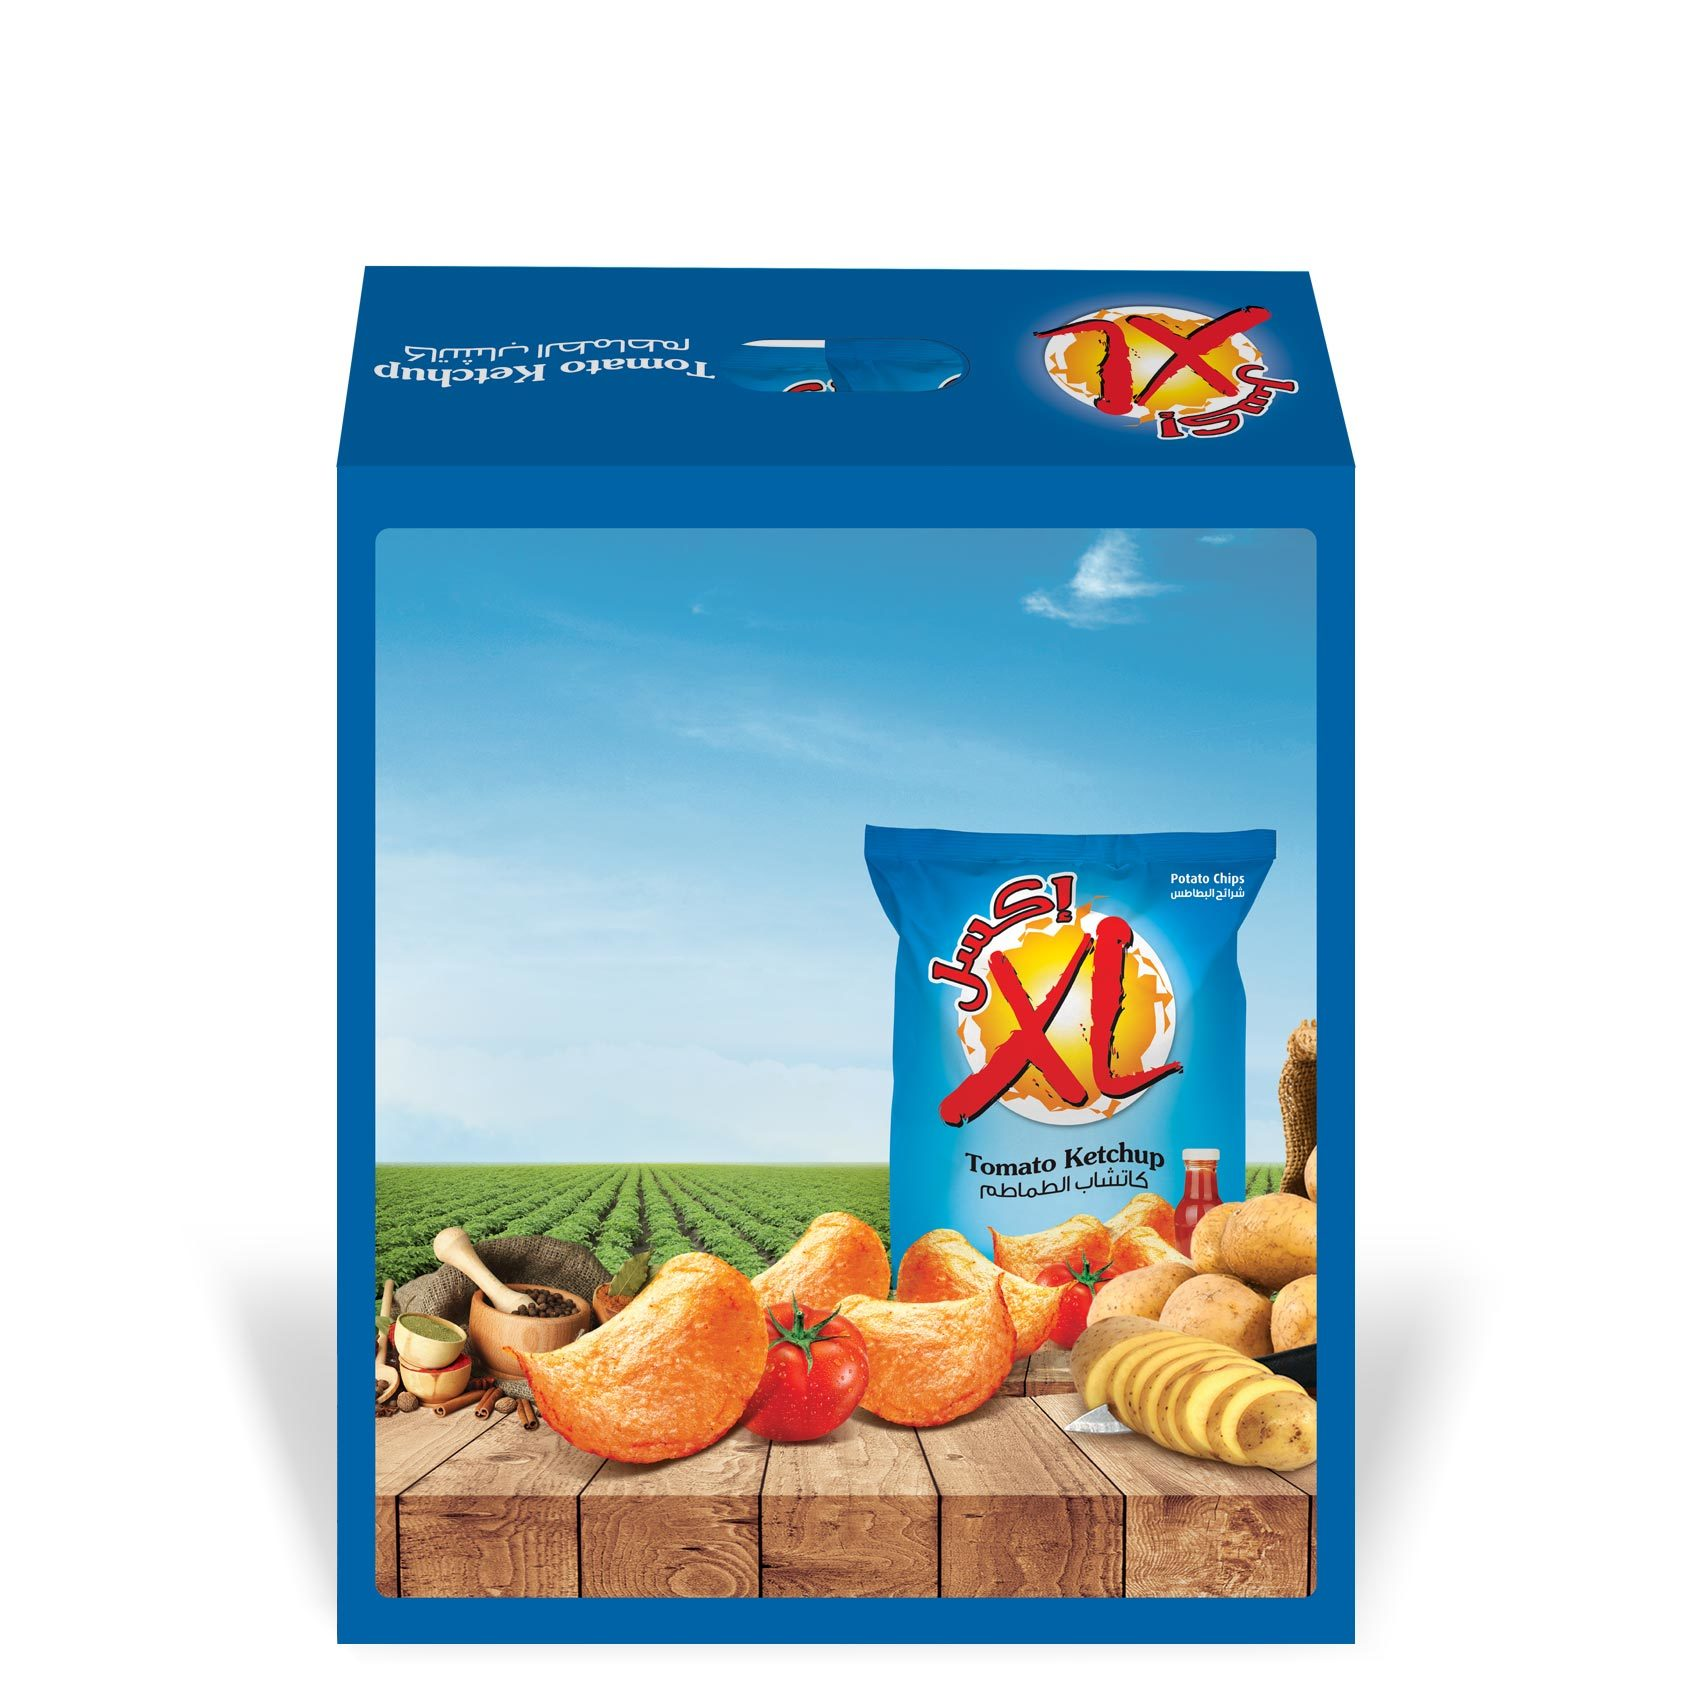 XL CHIPS KETCHUP DUPLEX 26GX14